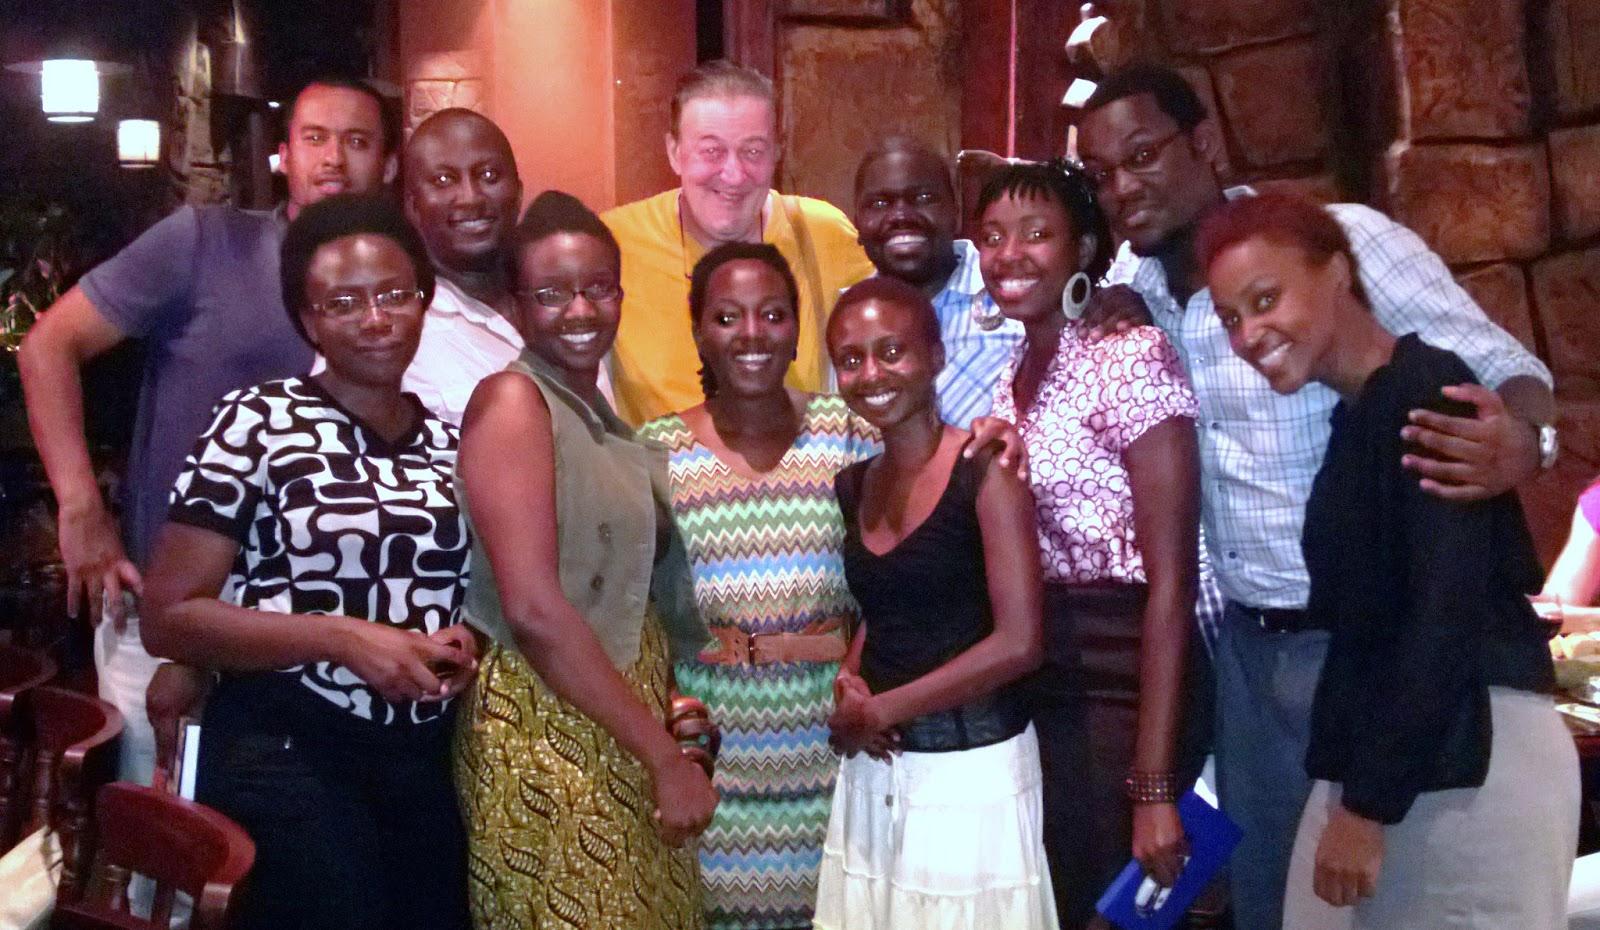 http://4.bp.blogspot.com/-dRIgGf4XnhI/USPgBiQ7ogI/AAAAAAAAIRM/wkaRCcypmvY/s1600/stephen+fry+with+ugandans.jpg